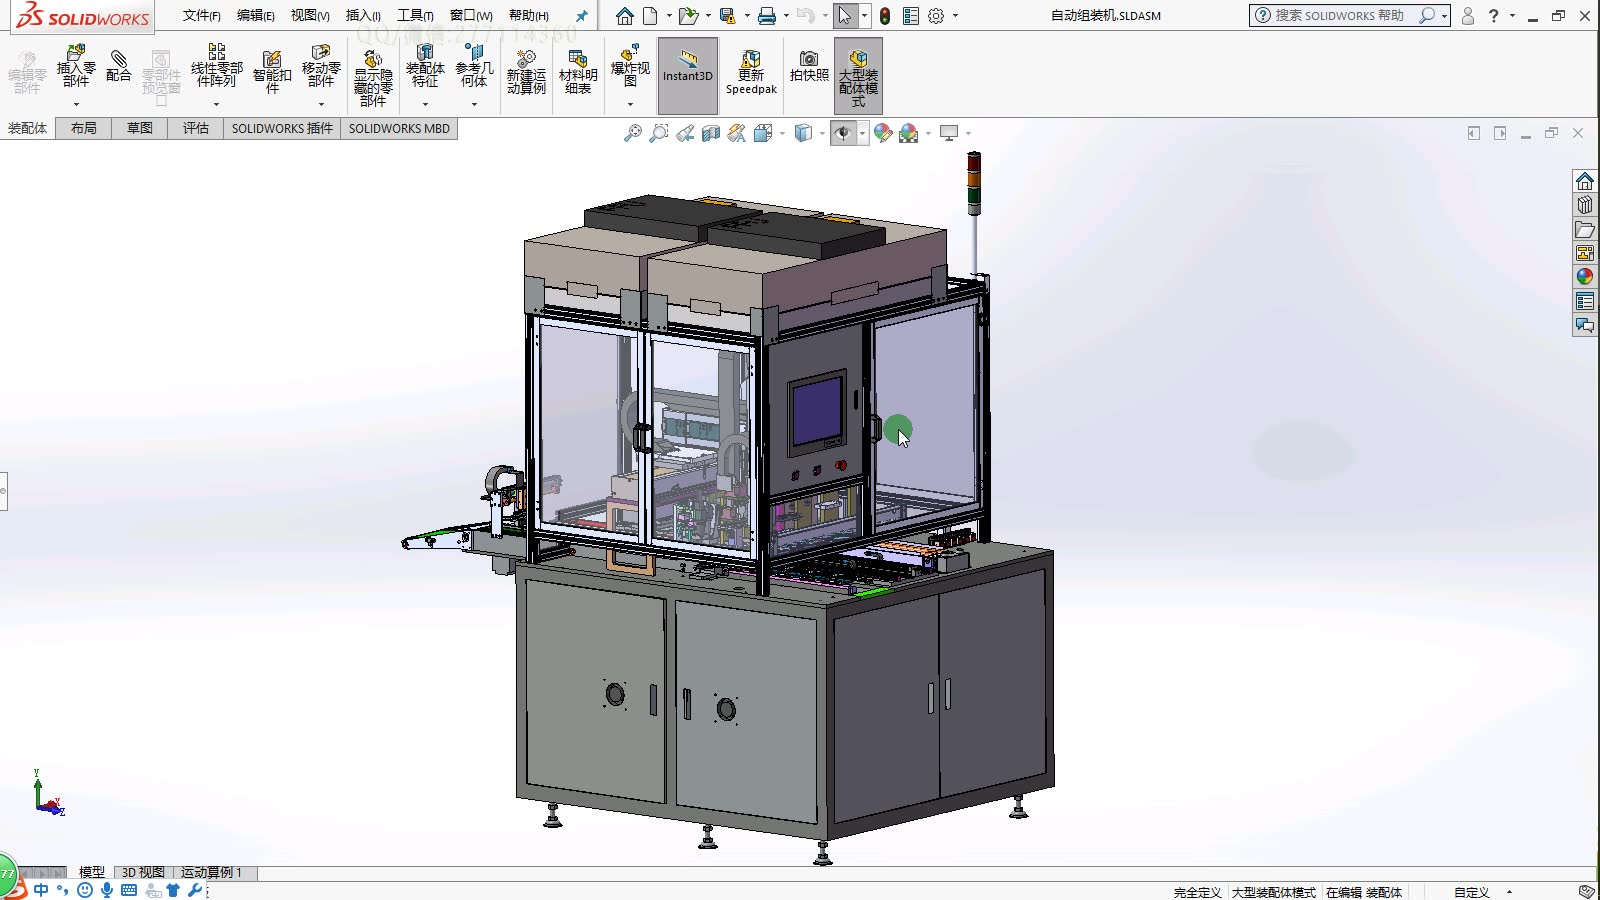 solidworks安装教程_SolidWorks教程,SolidWorks全套非标自动化设计视频教程_哔哩哔哩 (゜ ...